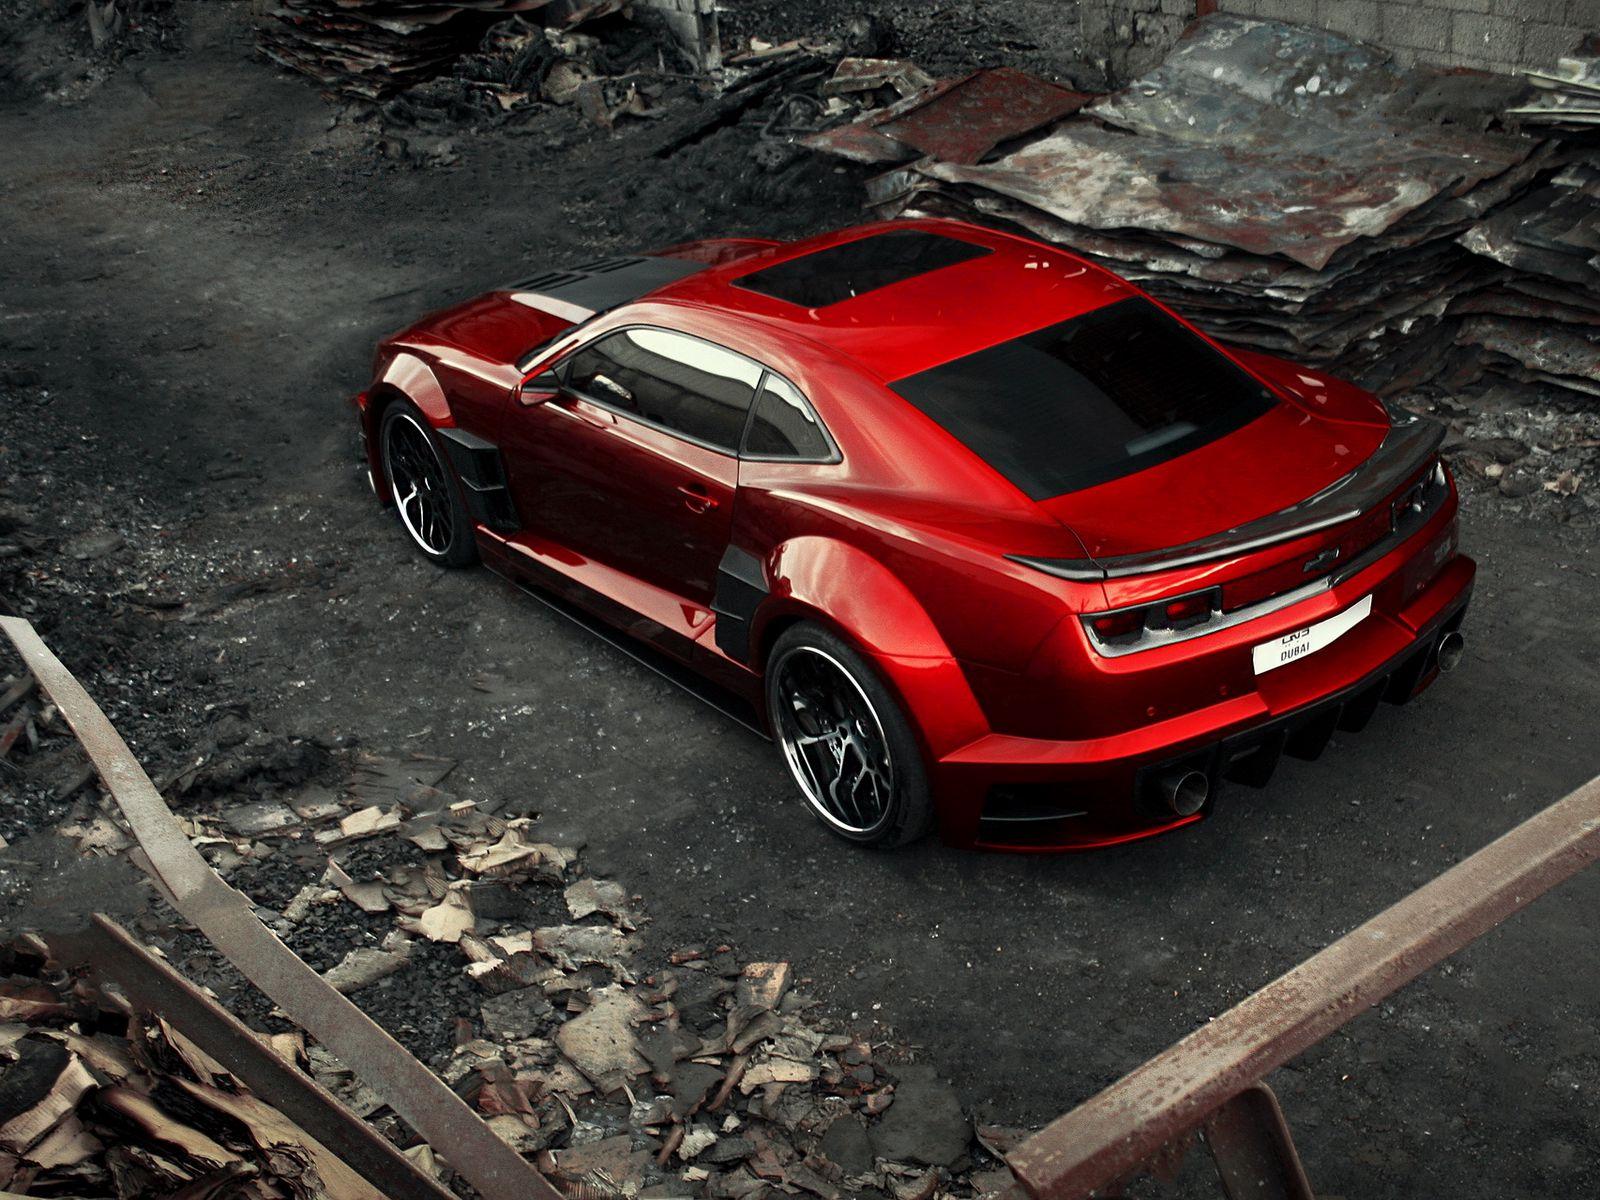 1600x1200 Wallpaper chevrolet camaro, chevy camaro, carbon, red, top view